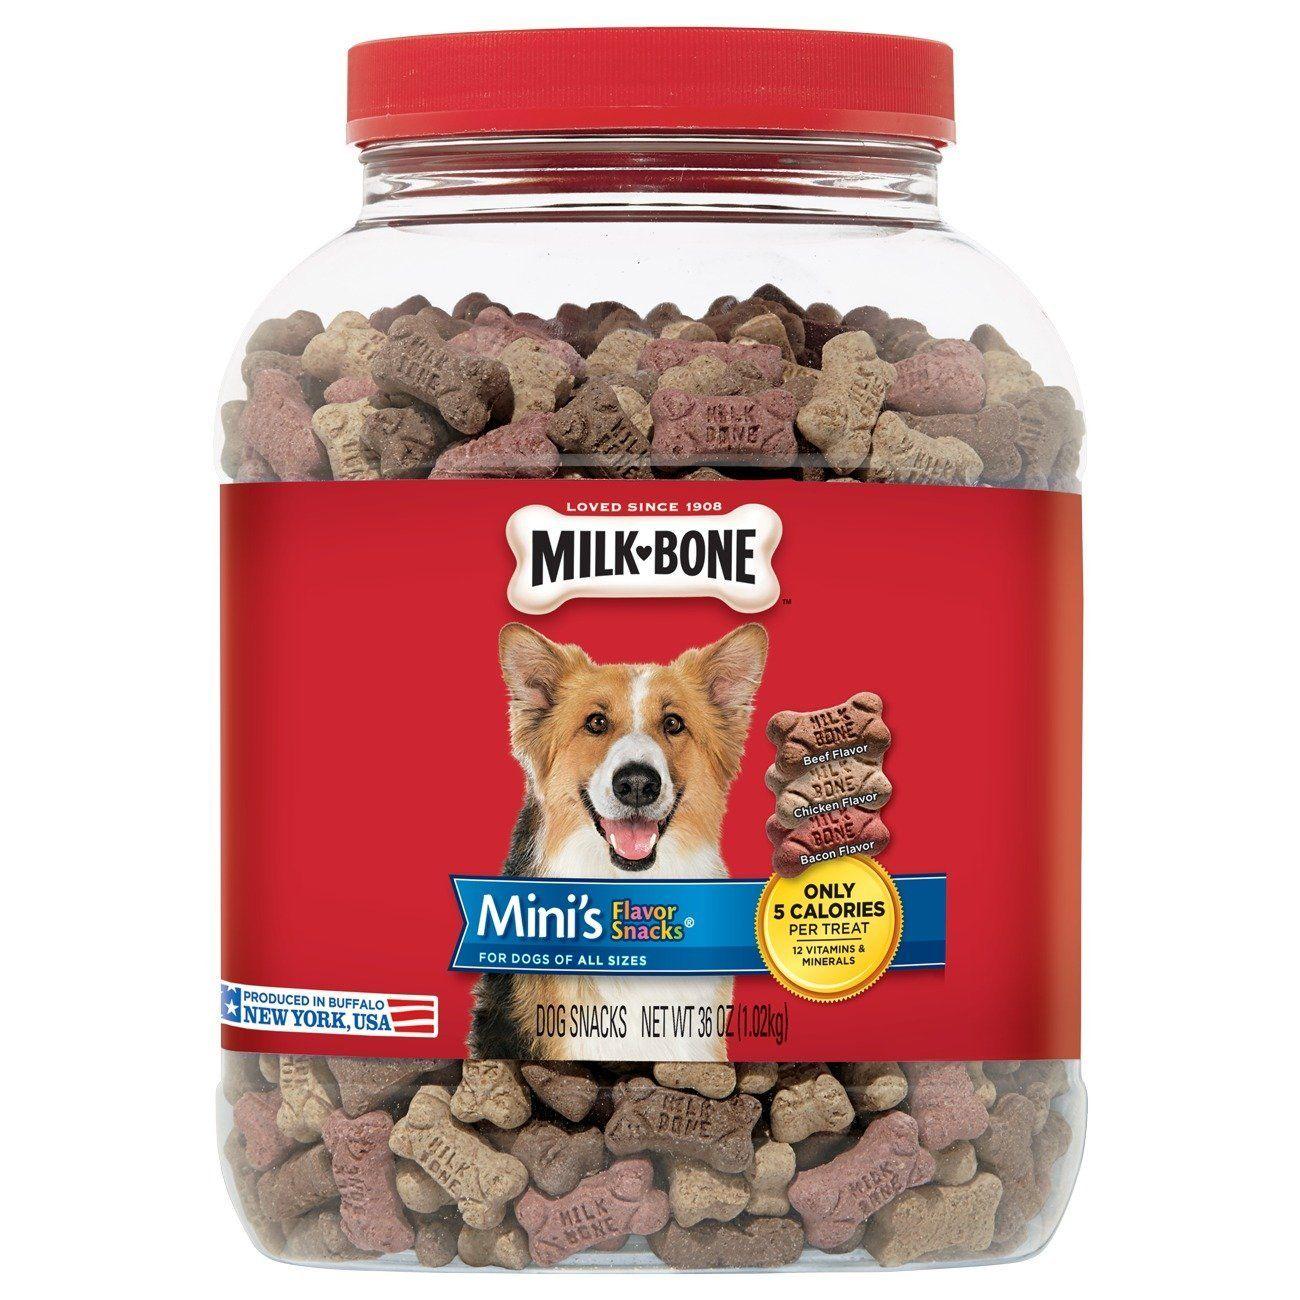 Amazon.com : Milk-Bone Mini Flavor Snacks Dog Treats, 36 oz : Pet Supplies